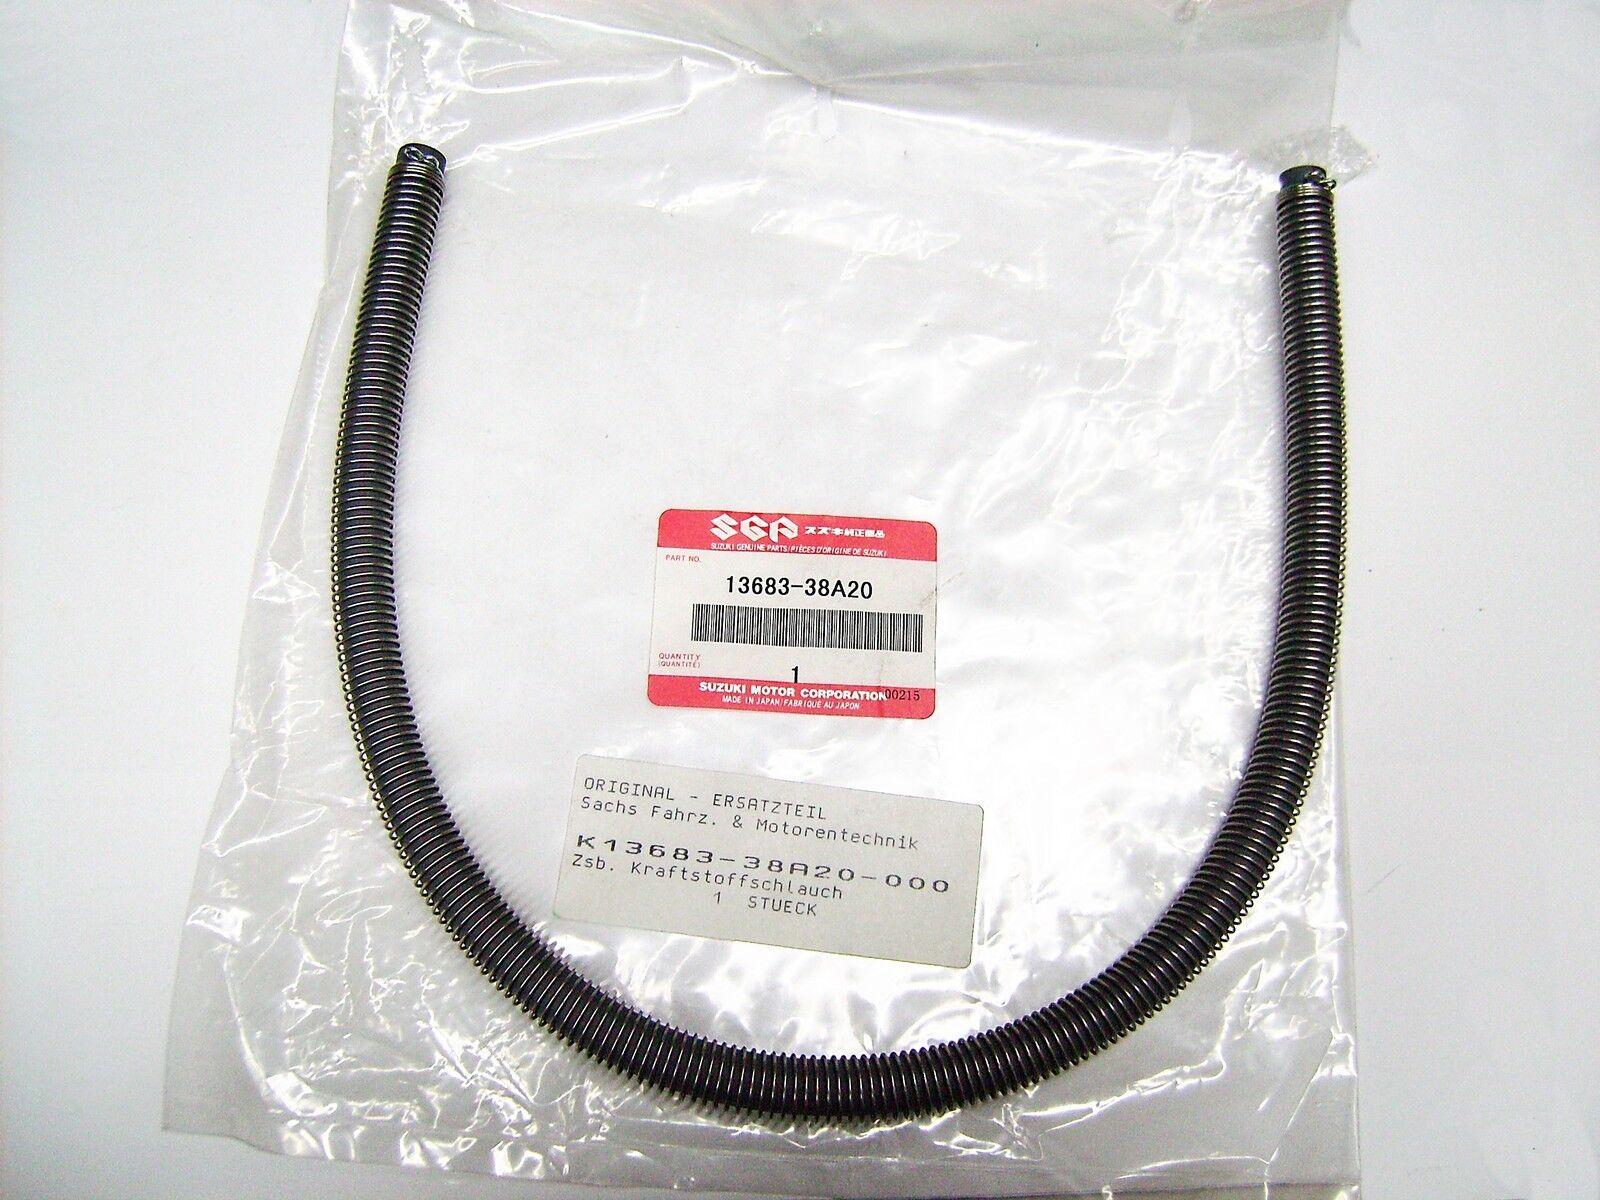 113881633C BEETLE Seat Tilt Lever for Backrest 67-71 round type